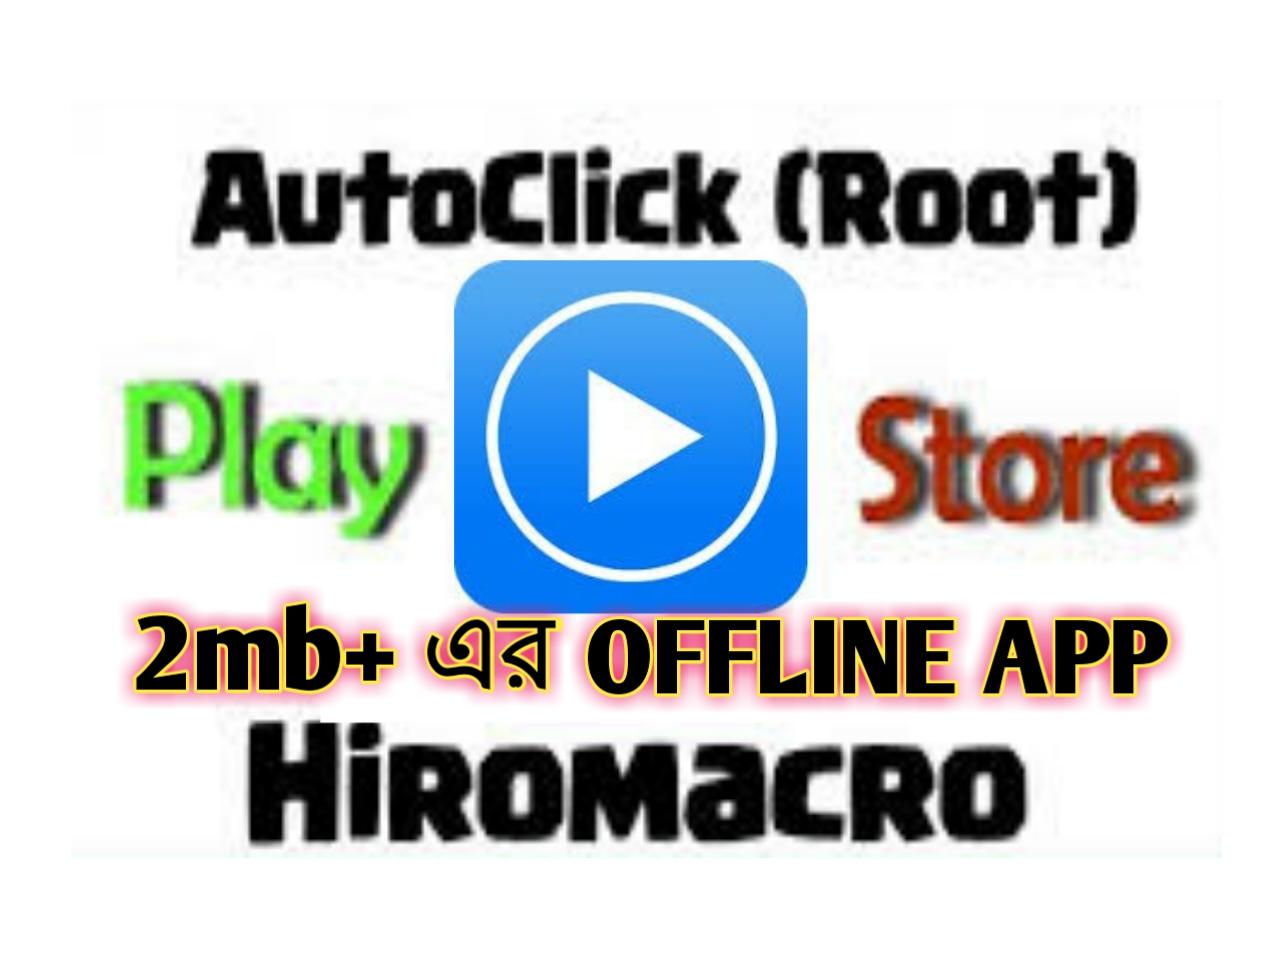 [Requested] Android Robot App ( AutoClick Bot ) কাজ বারবার করান, সাথে extra Feature গুলো নিয়ে এবারের Full টিউটরিয়াল [ আপনার কাজ হবে আরও বেশি speedy + easier than easy + কিছু করা লাগবে না + just  set করুন + বসে মজা নিন ] 100% offline-এ মাত্র 2mb এর App Free